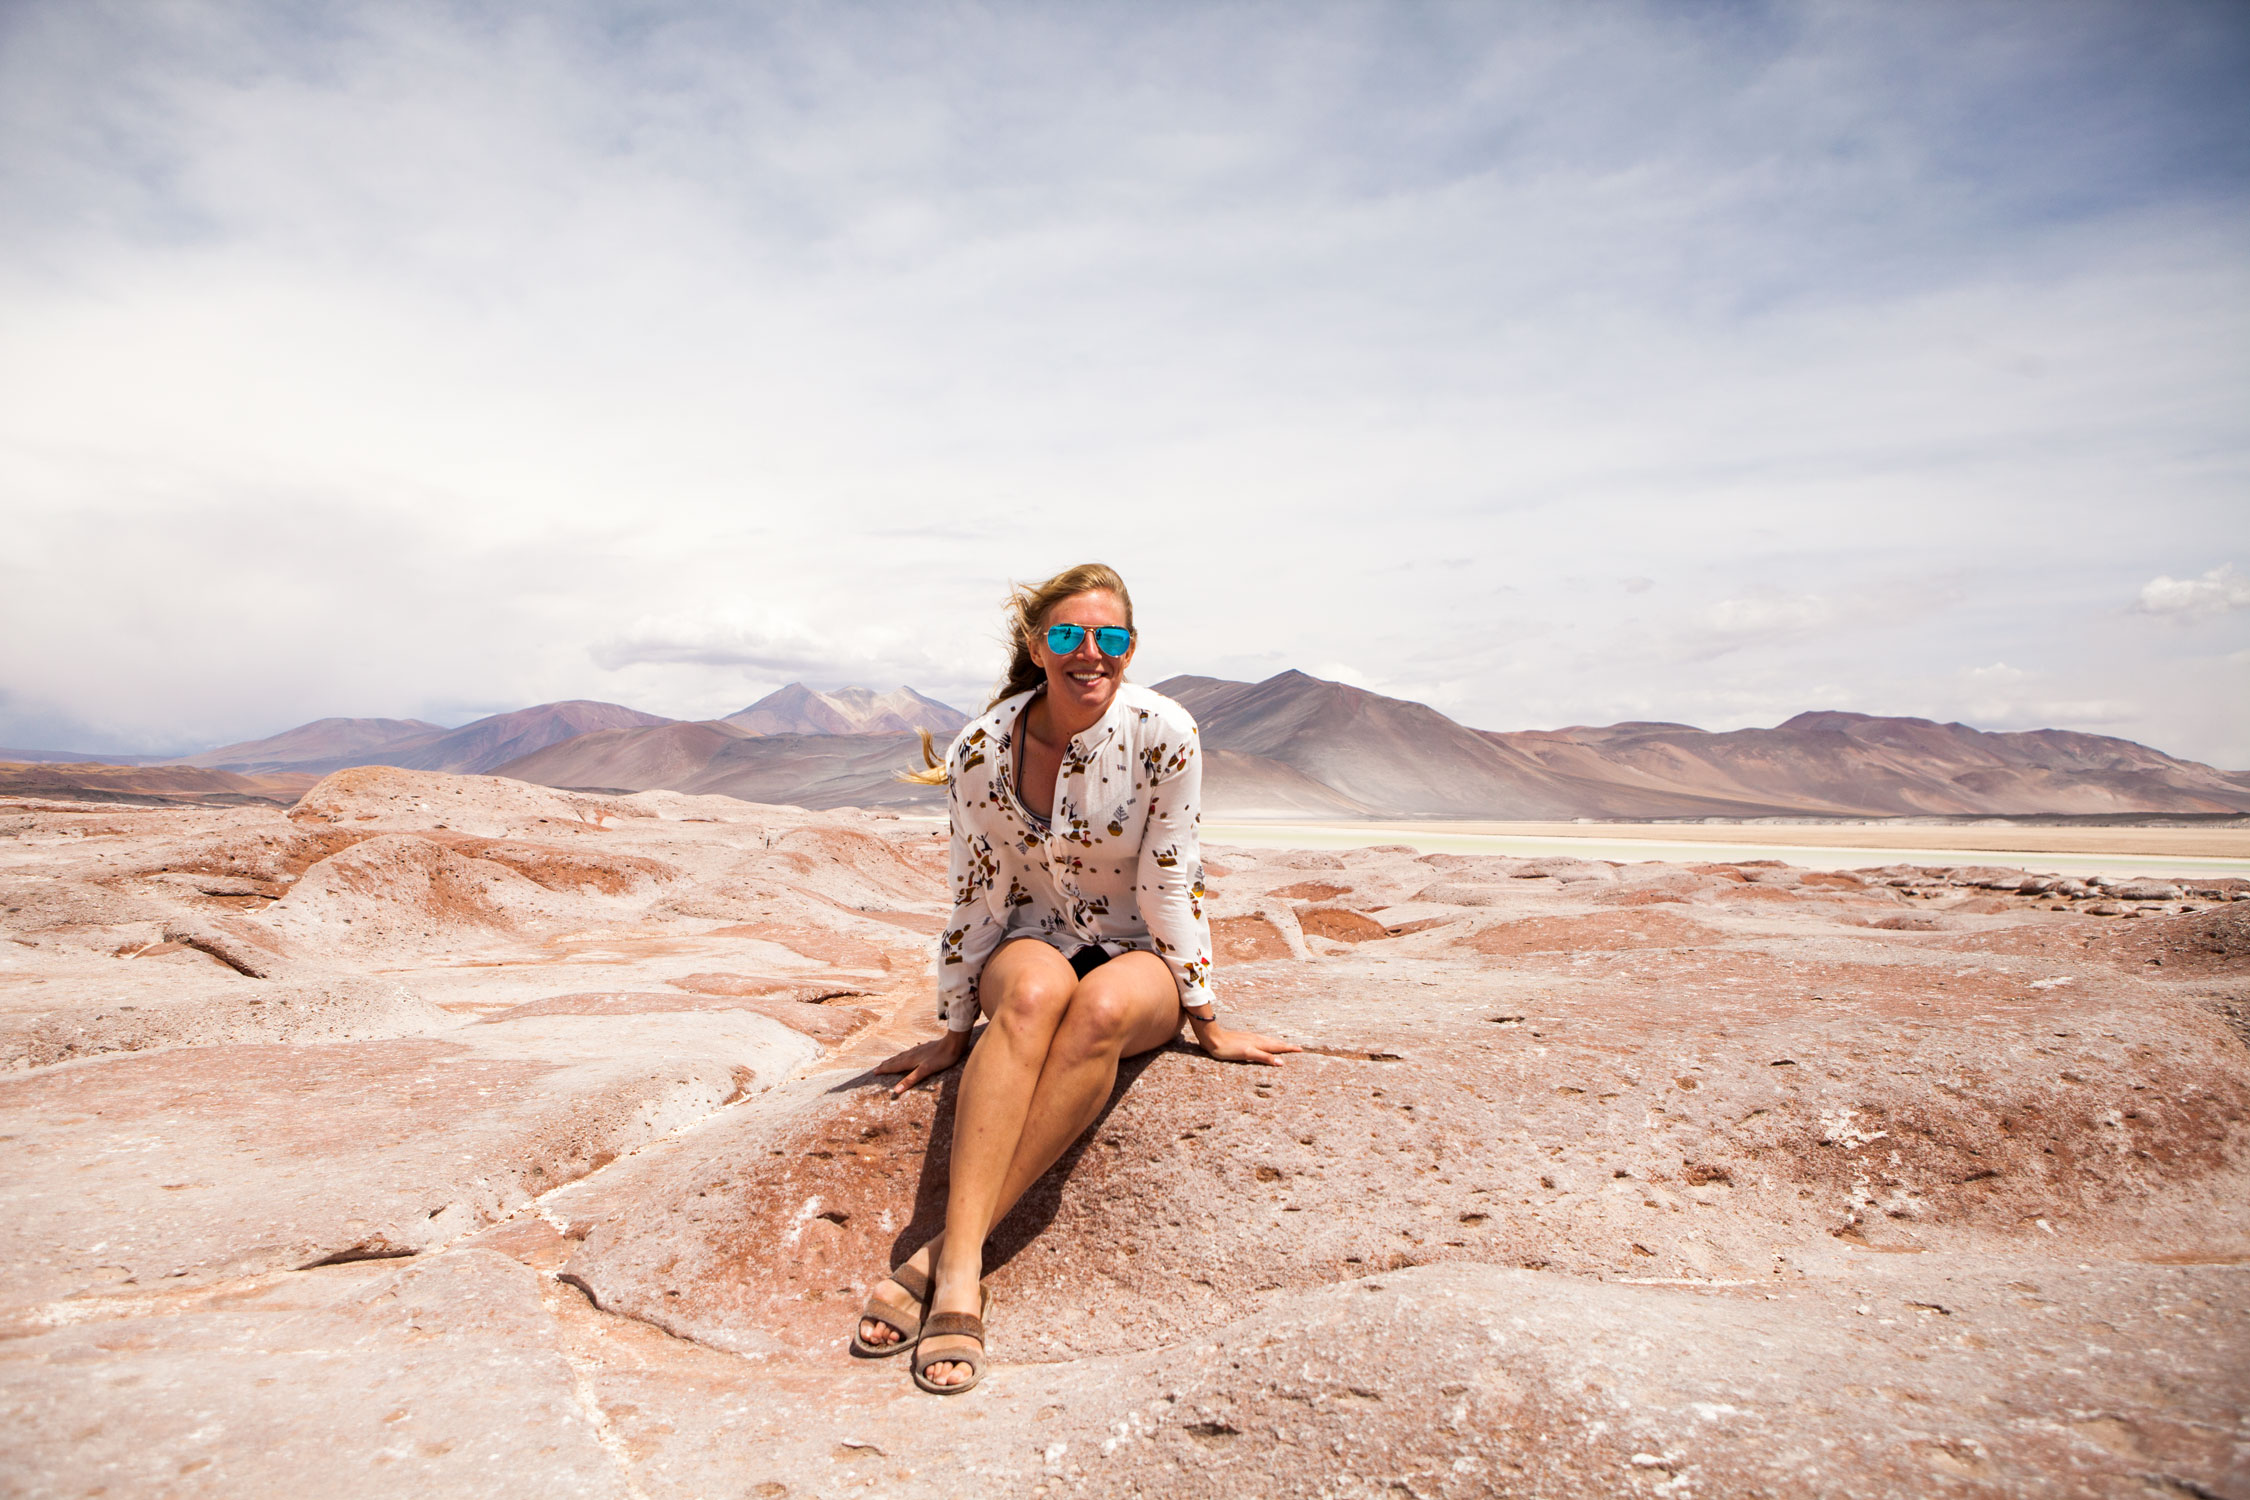 atacama-desert-chile-wander-south-piedras-rojas-Meg-4.jpg